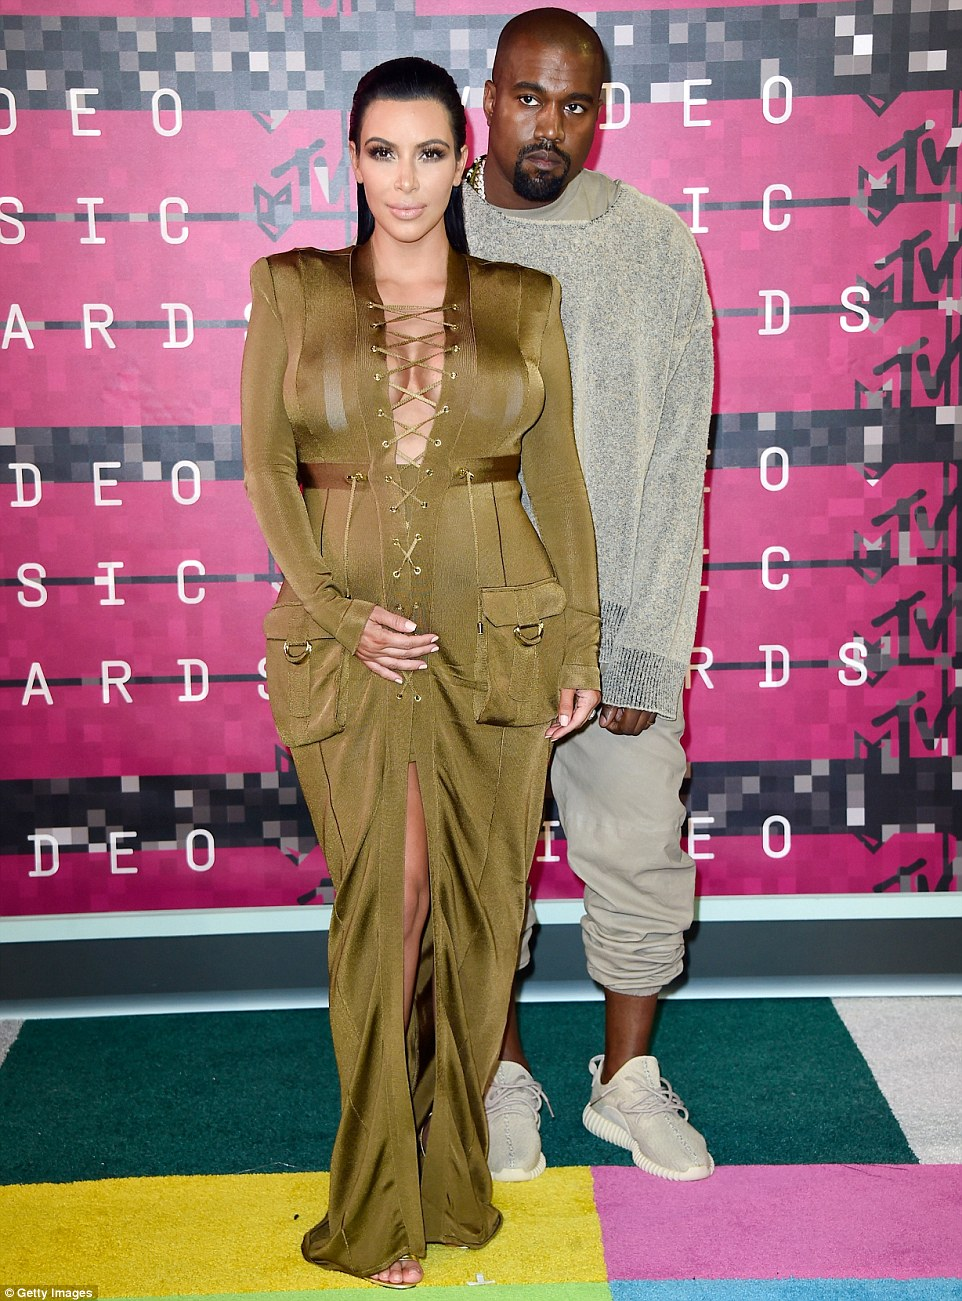 Direito ao seu lado: The 34-year-old estava lá para apoiá-la rapper outra metade, que está recebendo o Prêmio Vanguard durante a noite